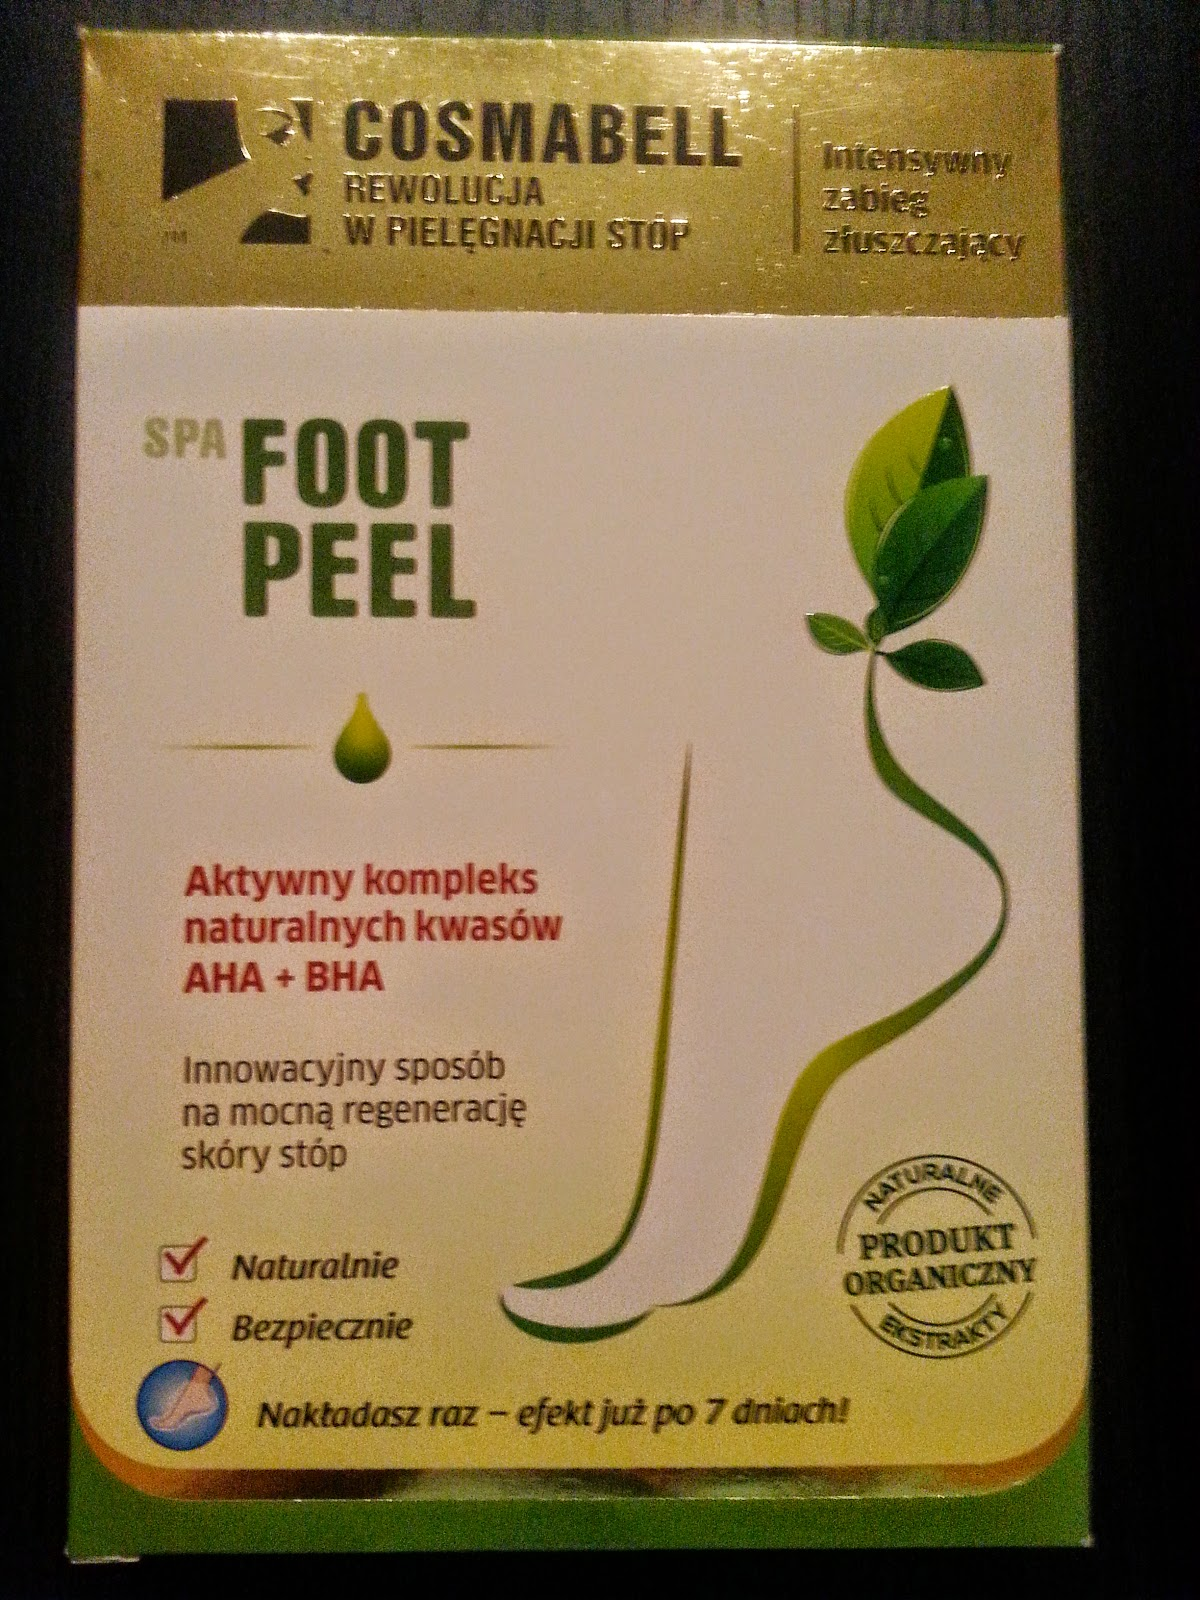 SPA FOOT PEEL marki COSMABELL, czyli skarpetki peelingujące